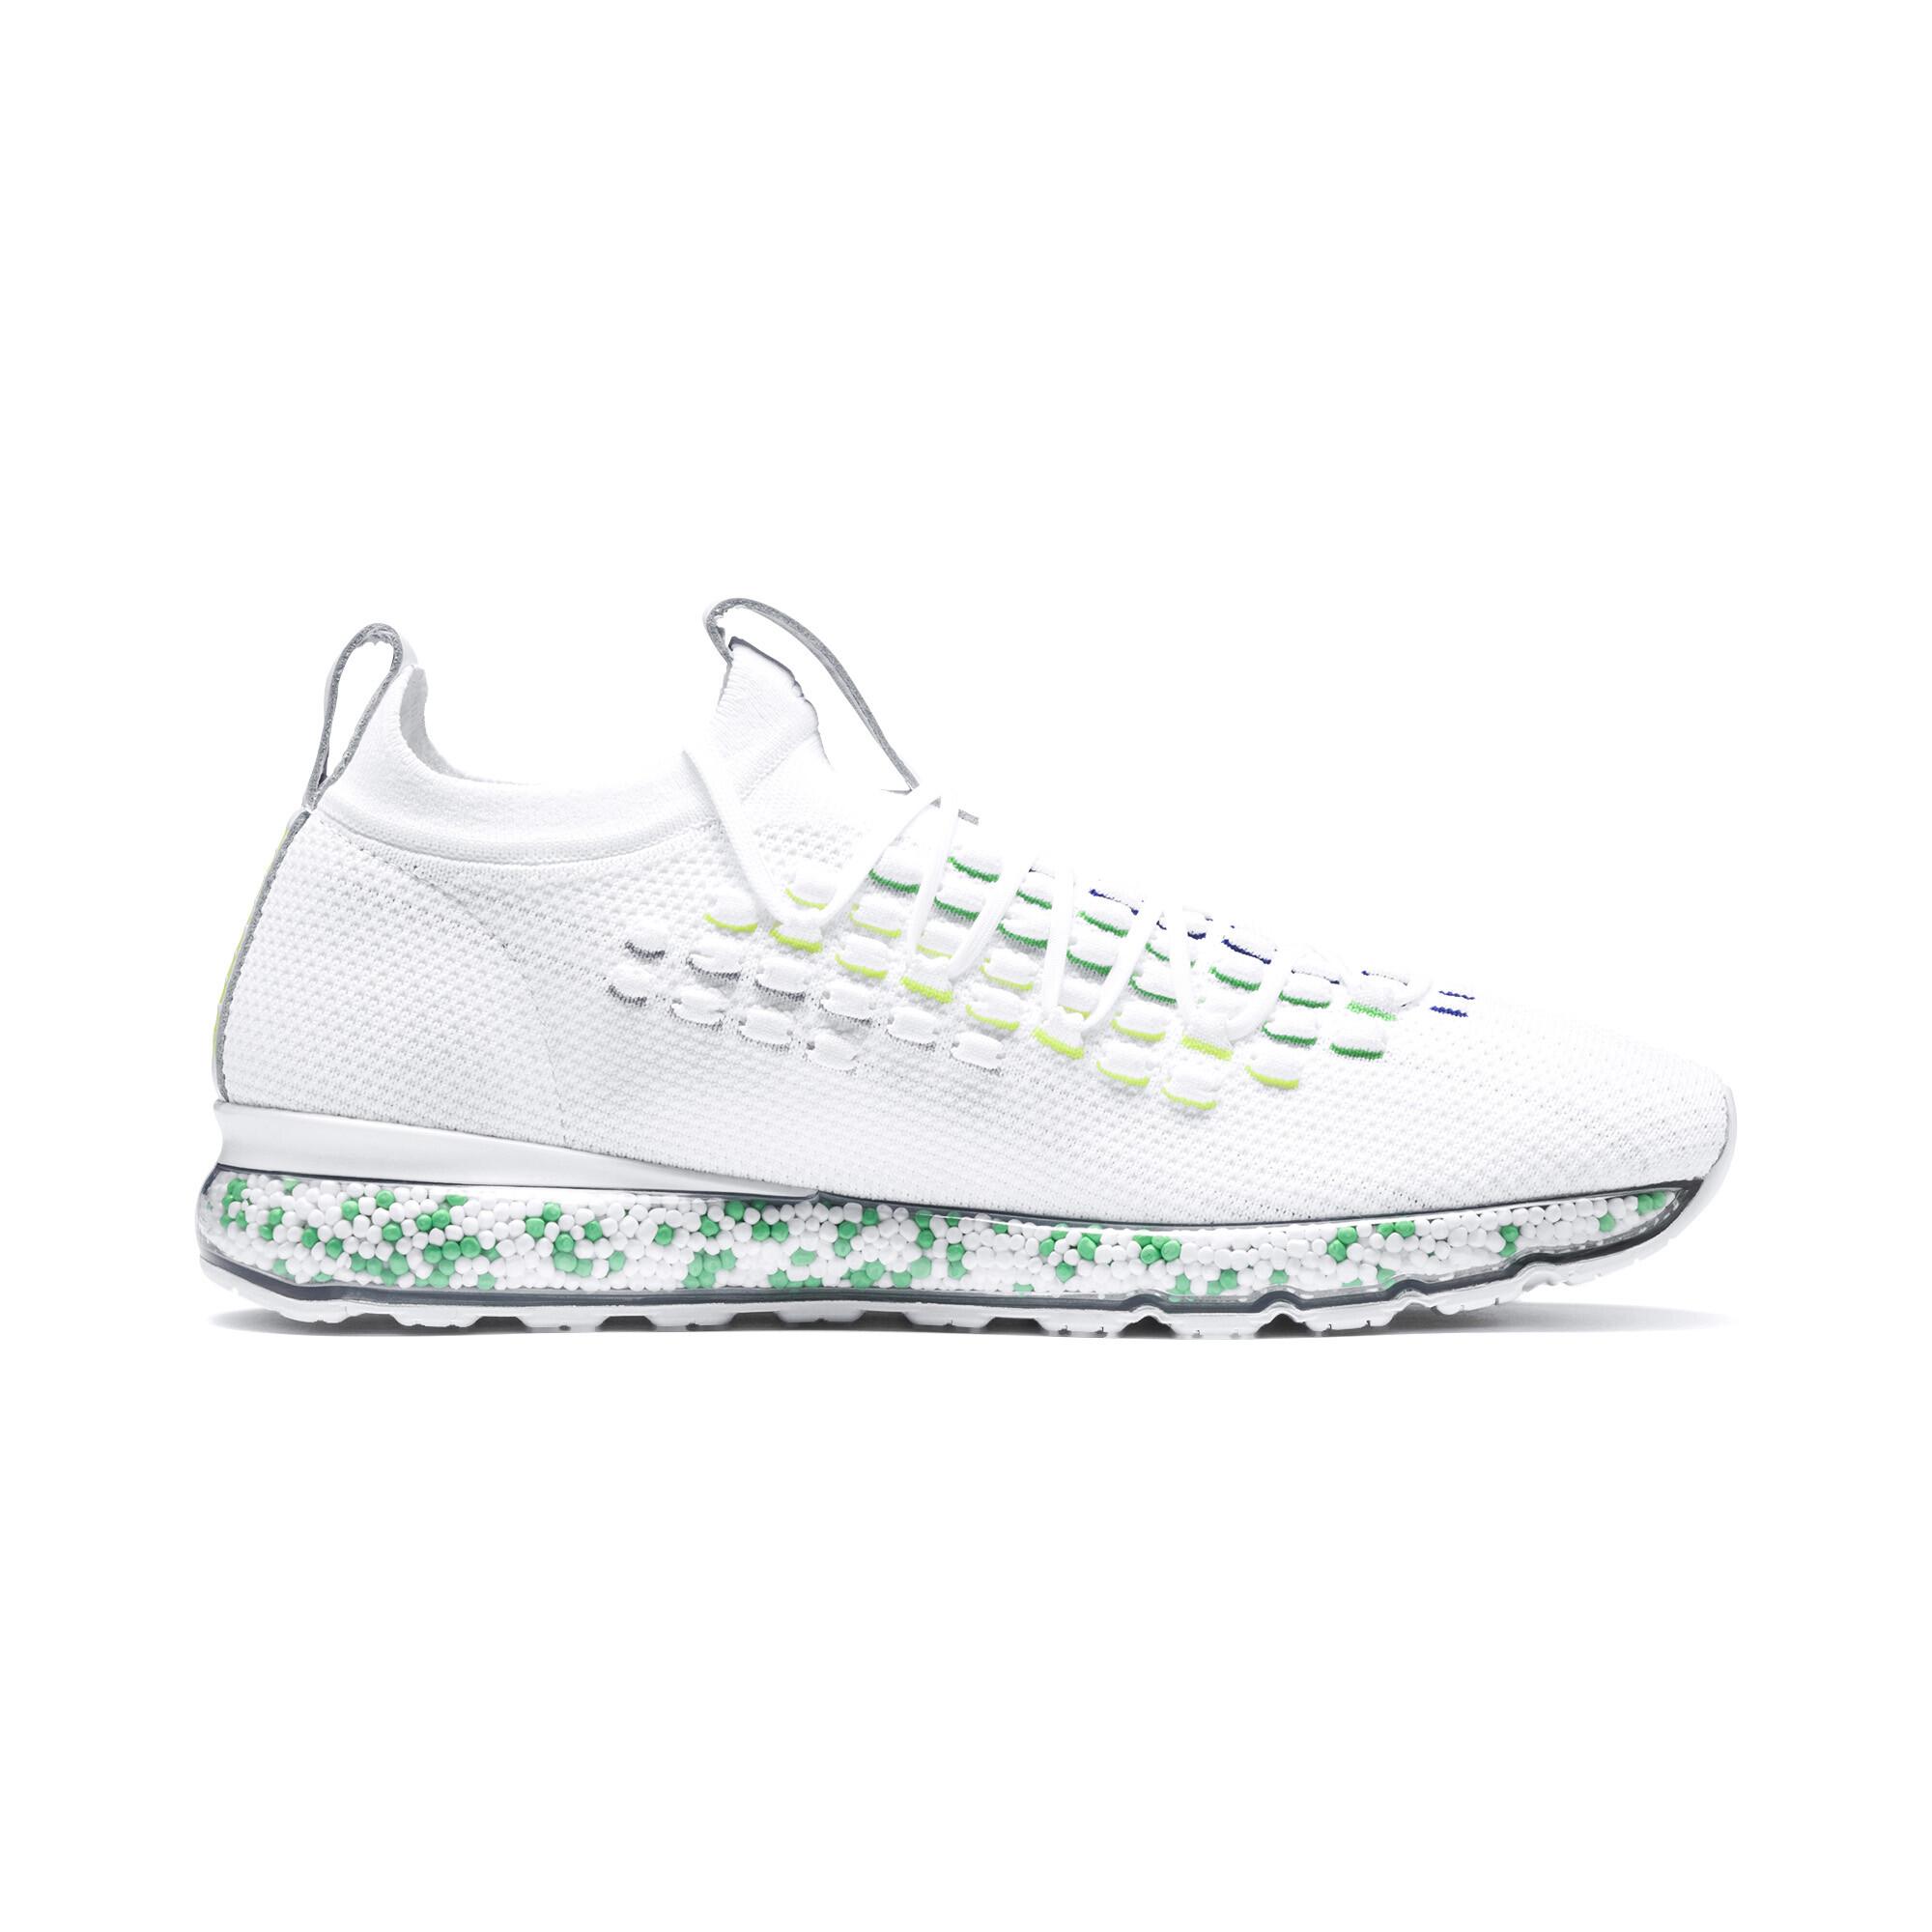 Image Puma JAMMING FUSEFIT Chameleon Sneakers #5